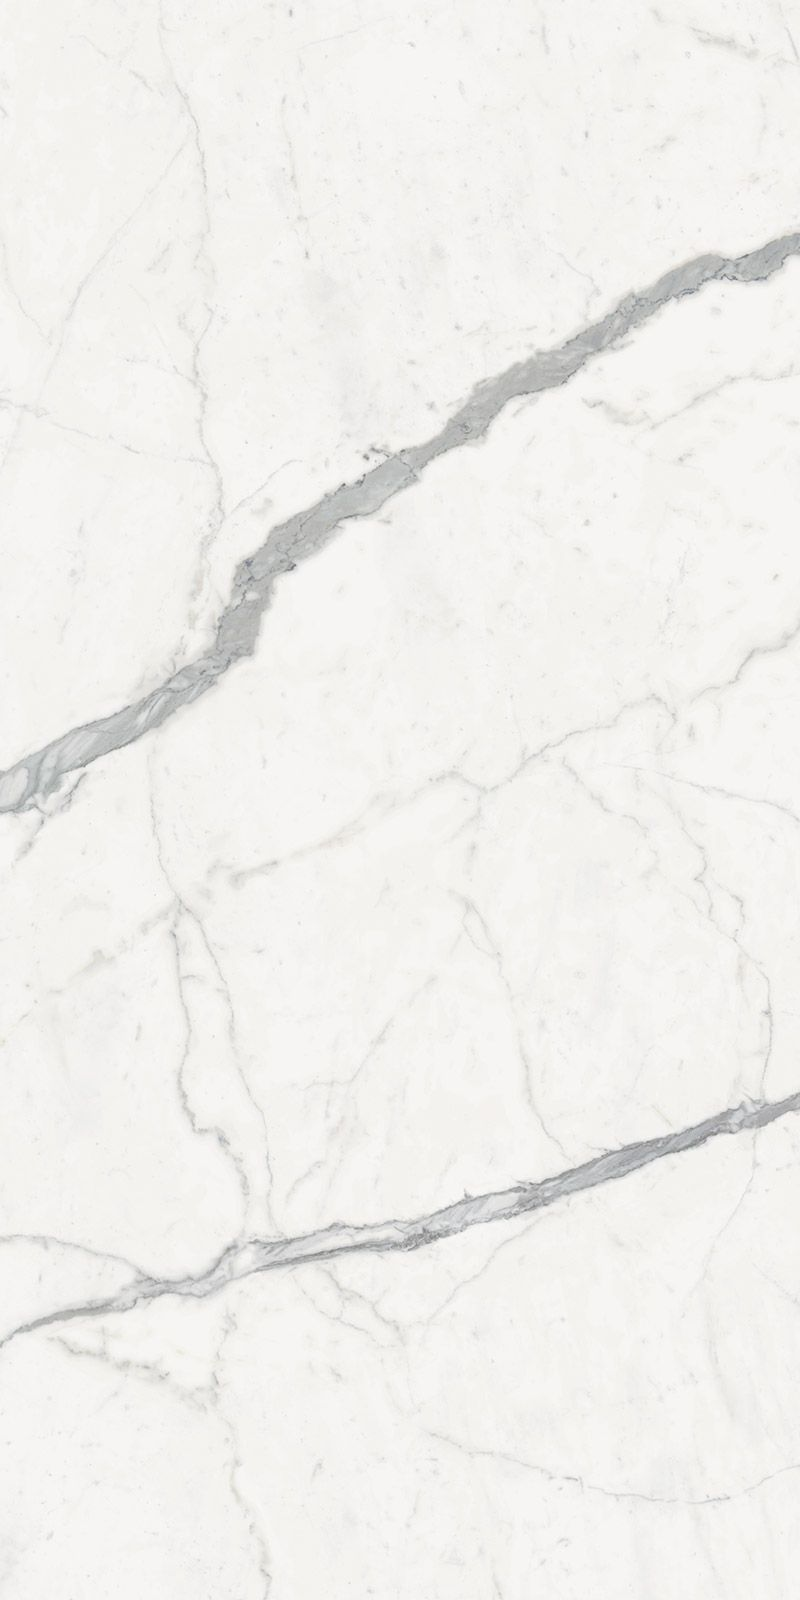 Porcelain tile calacatta statuario maximum marmi maximum calacatta statuario maximum marmi maximum white marble effect porcelain tiles dailygadgetfo Image collections